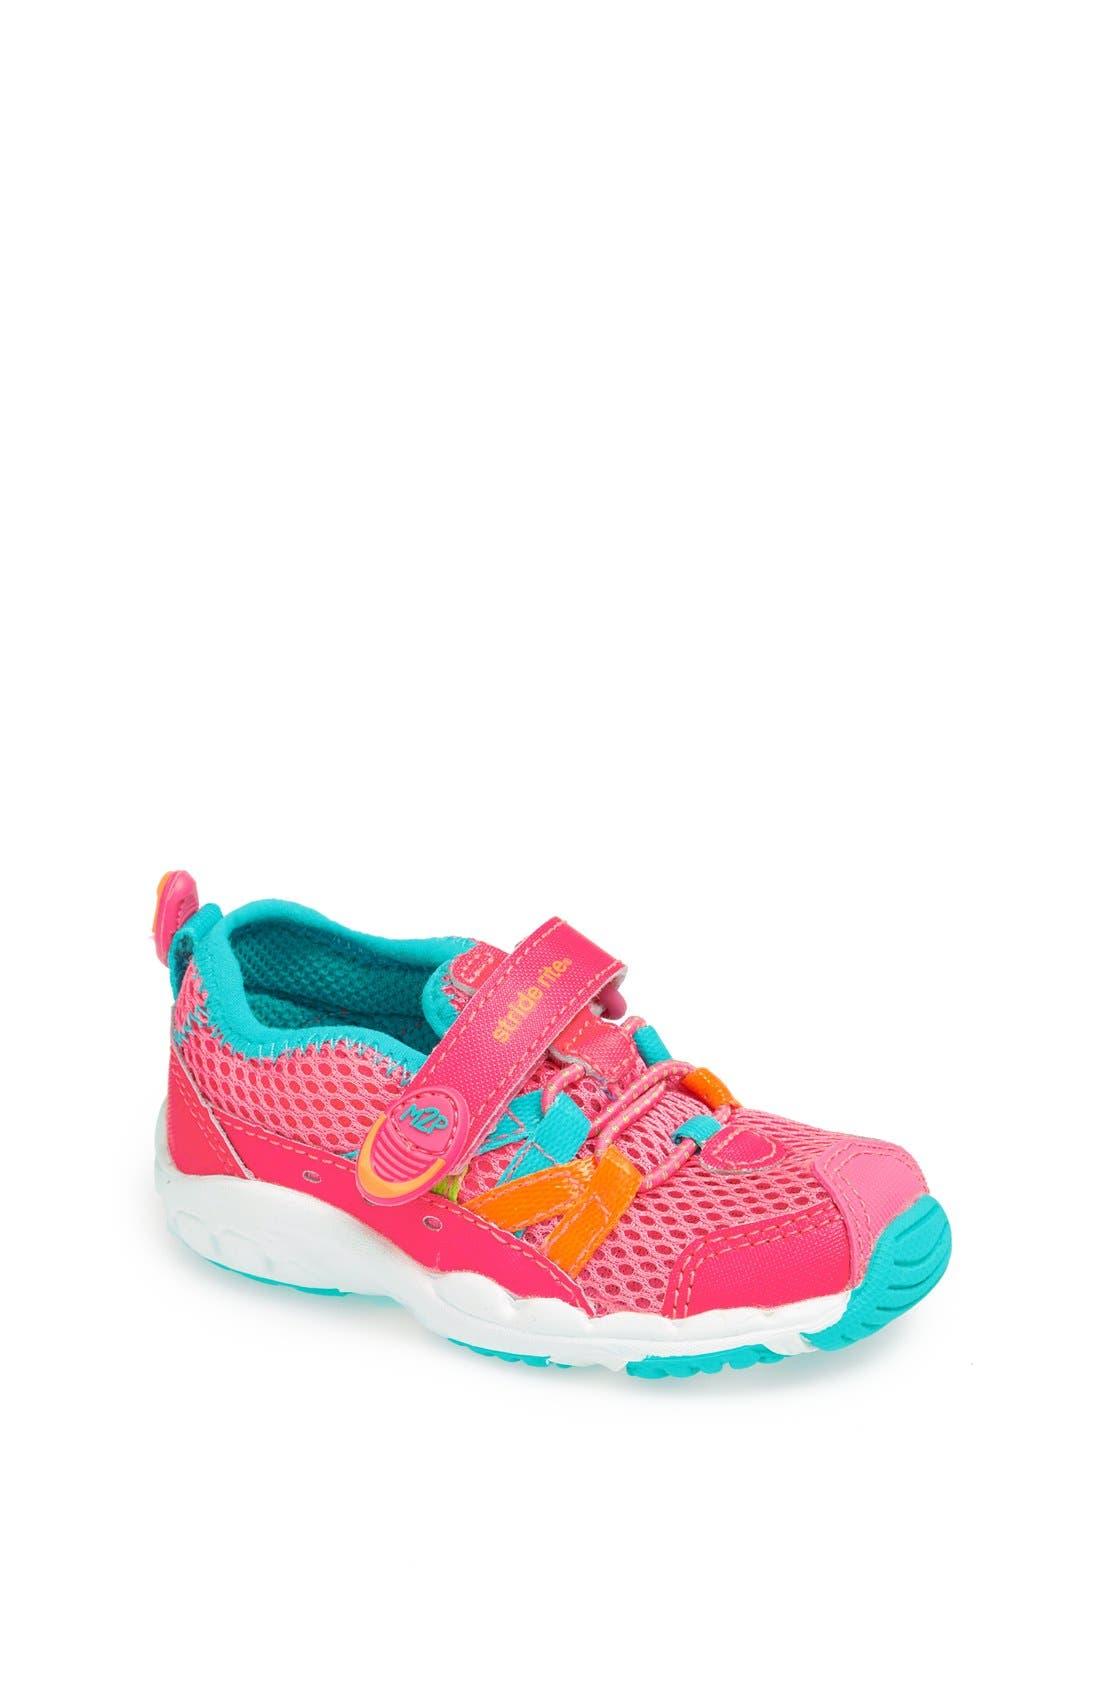 Alternate Image 1 Selected - Stride Rite 'Made 2 Play™ - Aqua' Sneaker (Baby, Walker & Toddler)